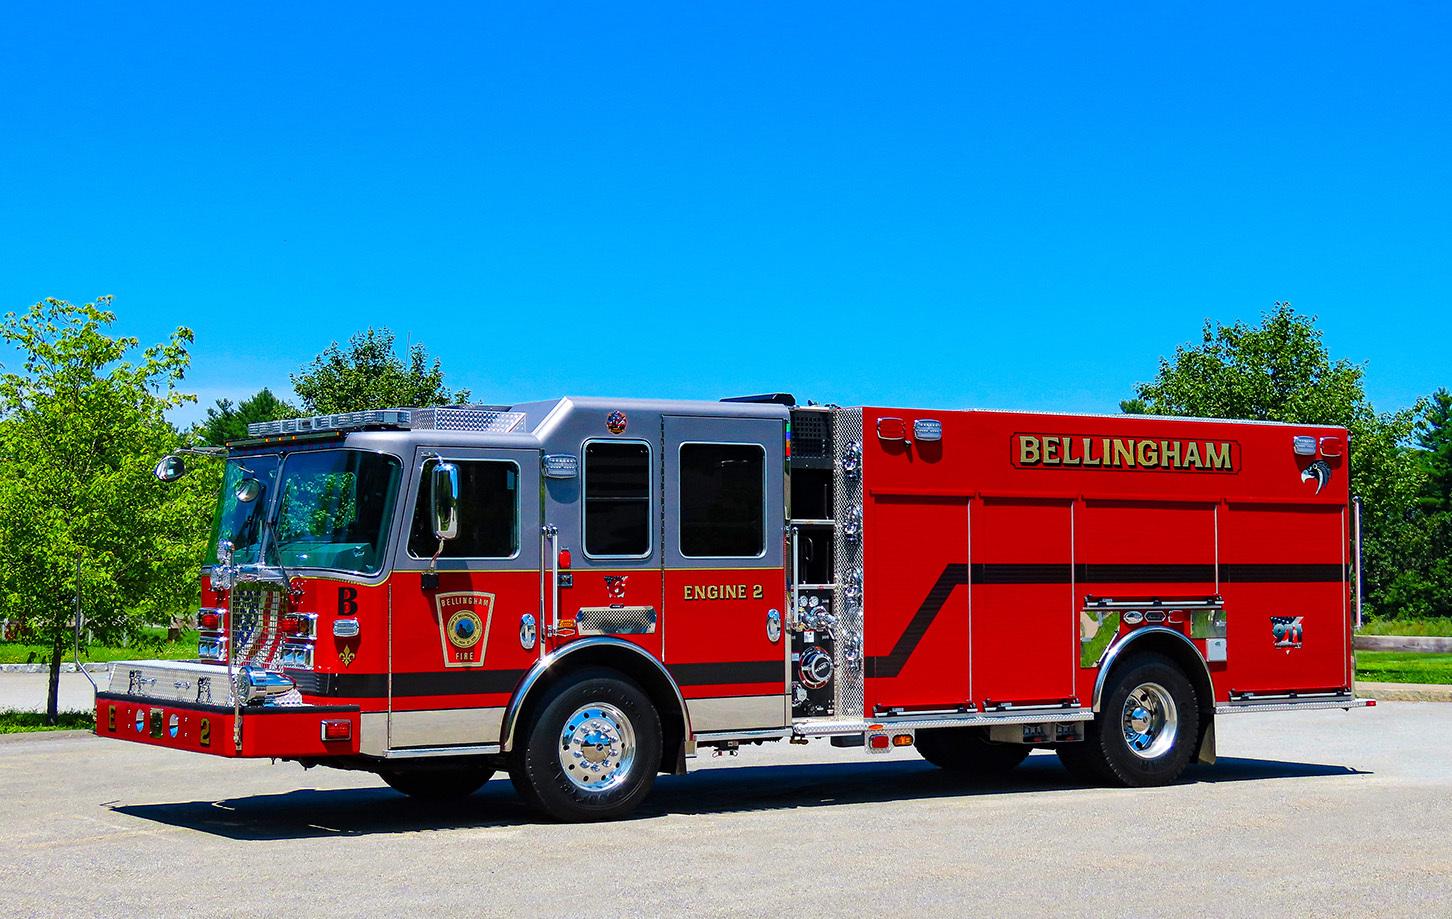 Bellingham-Engine-2-2019-GSO10830